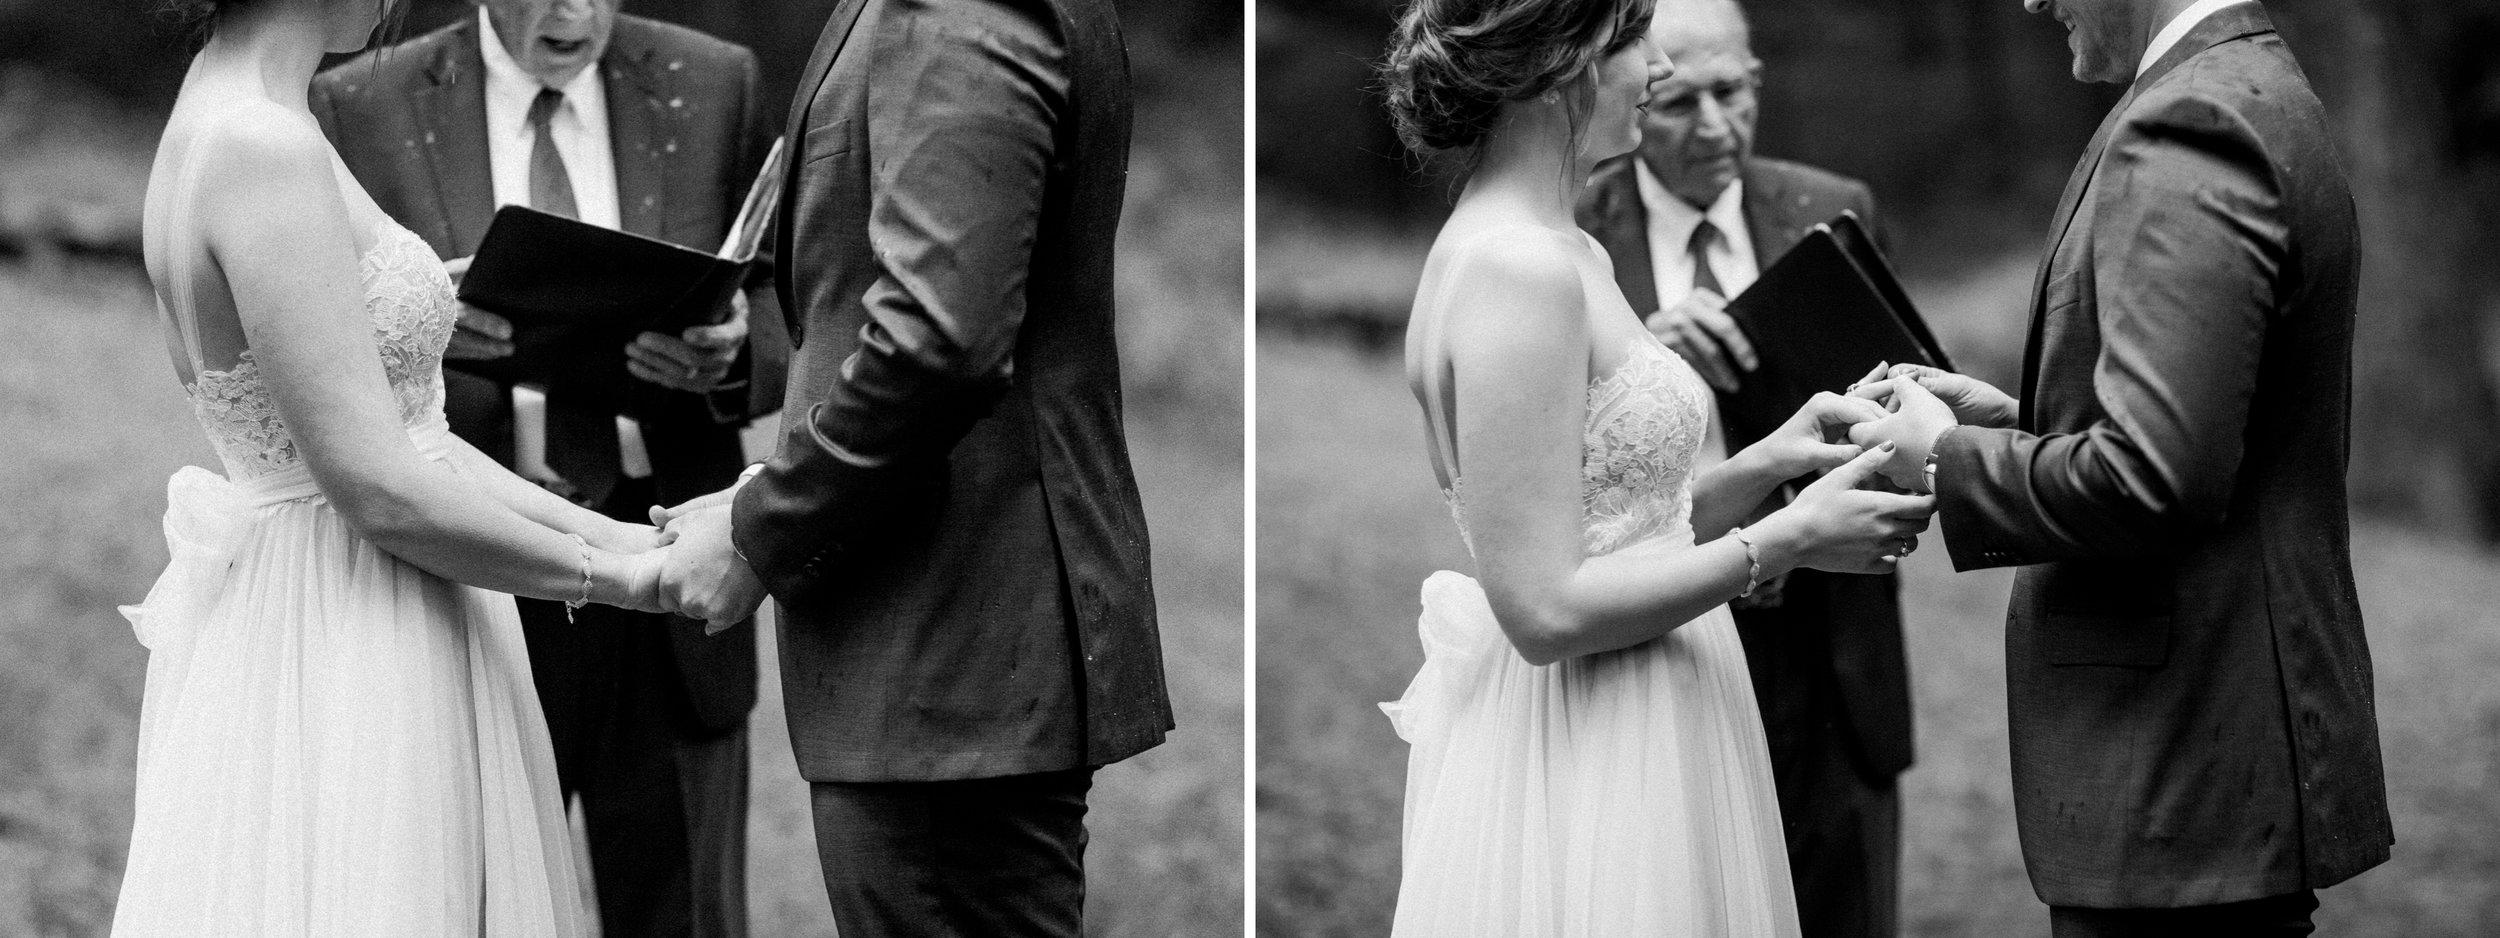 Our Wedding Post_065.JPG